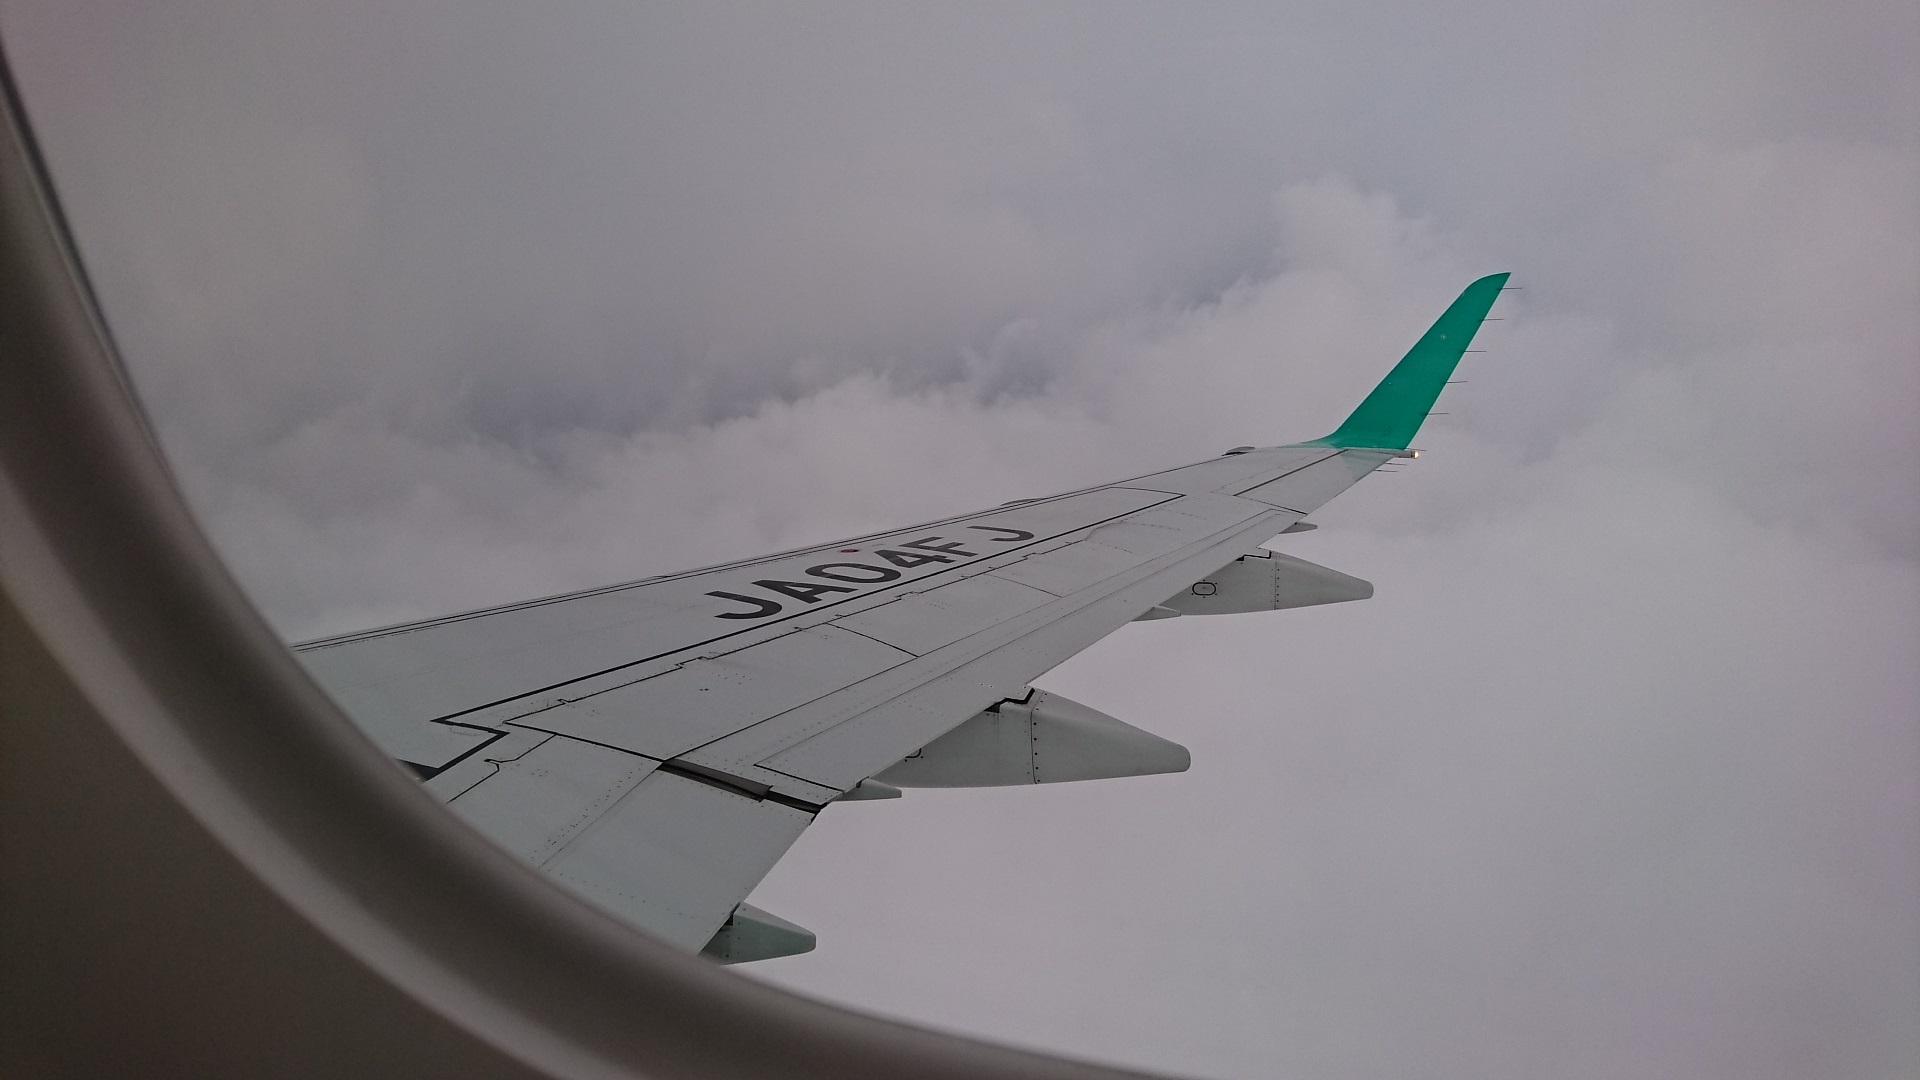 2018.7.7 (61) FDA名古屋空港いき - 兵庫県上空 1280-720